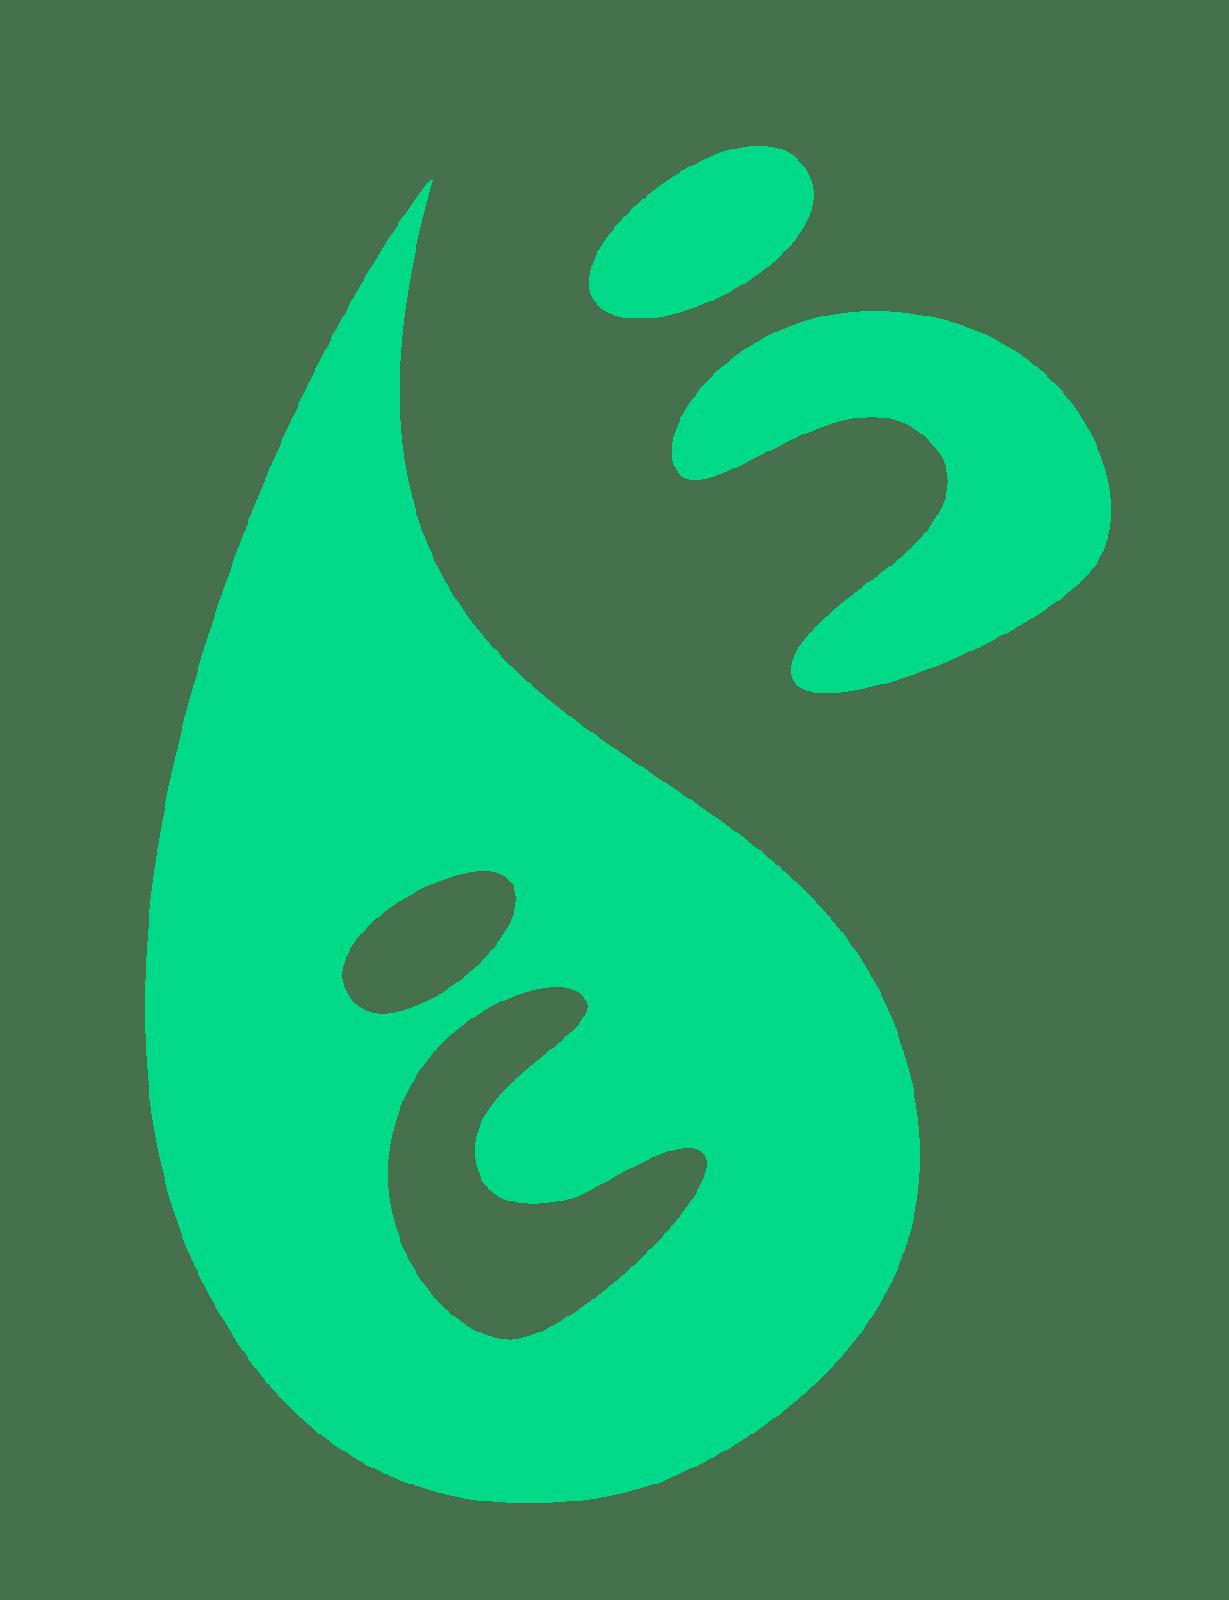 Logo SEE grap vert clair #00D989 2